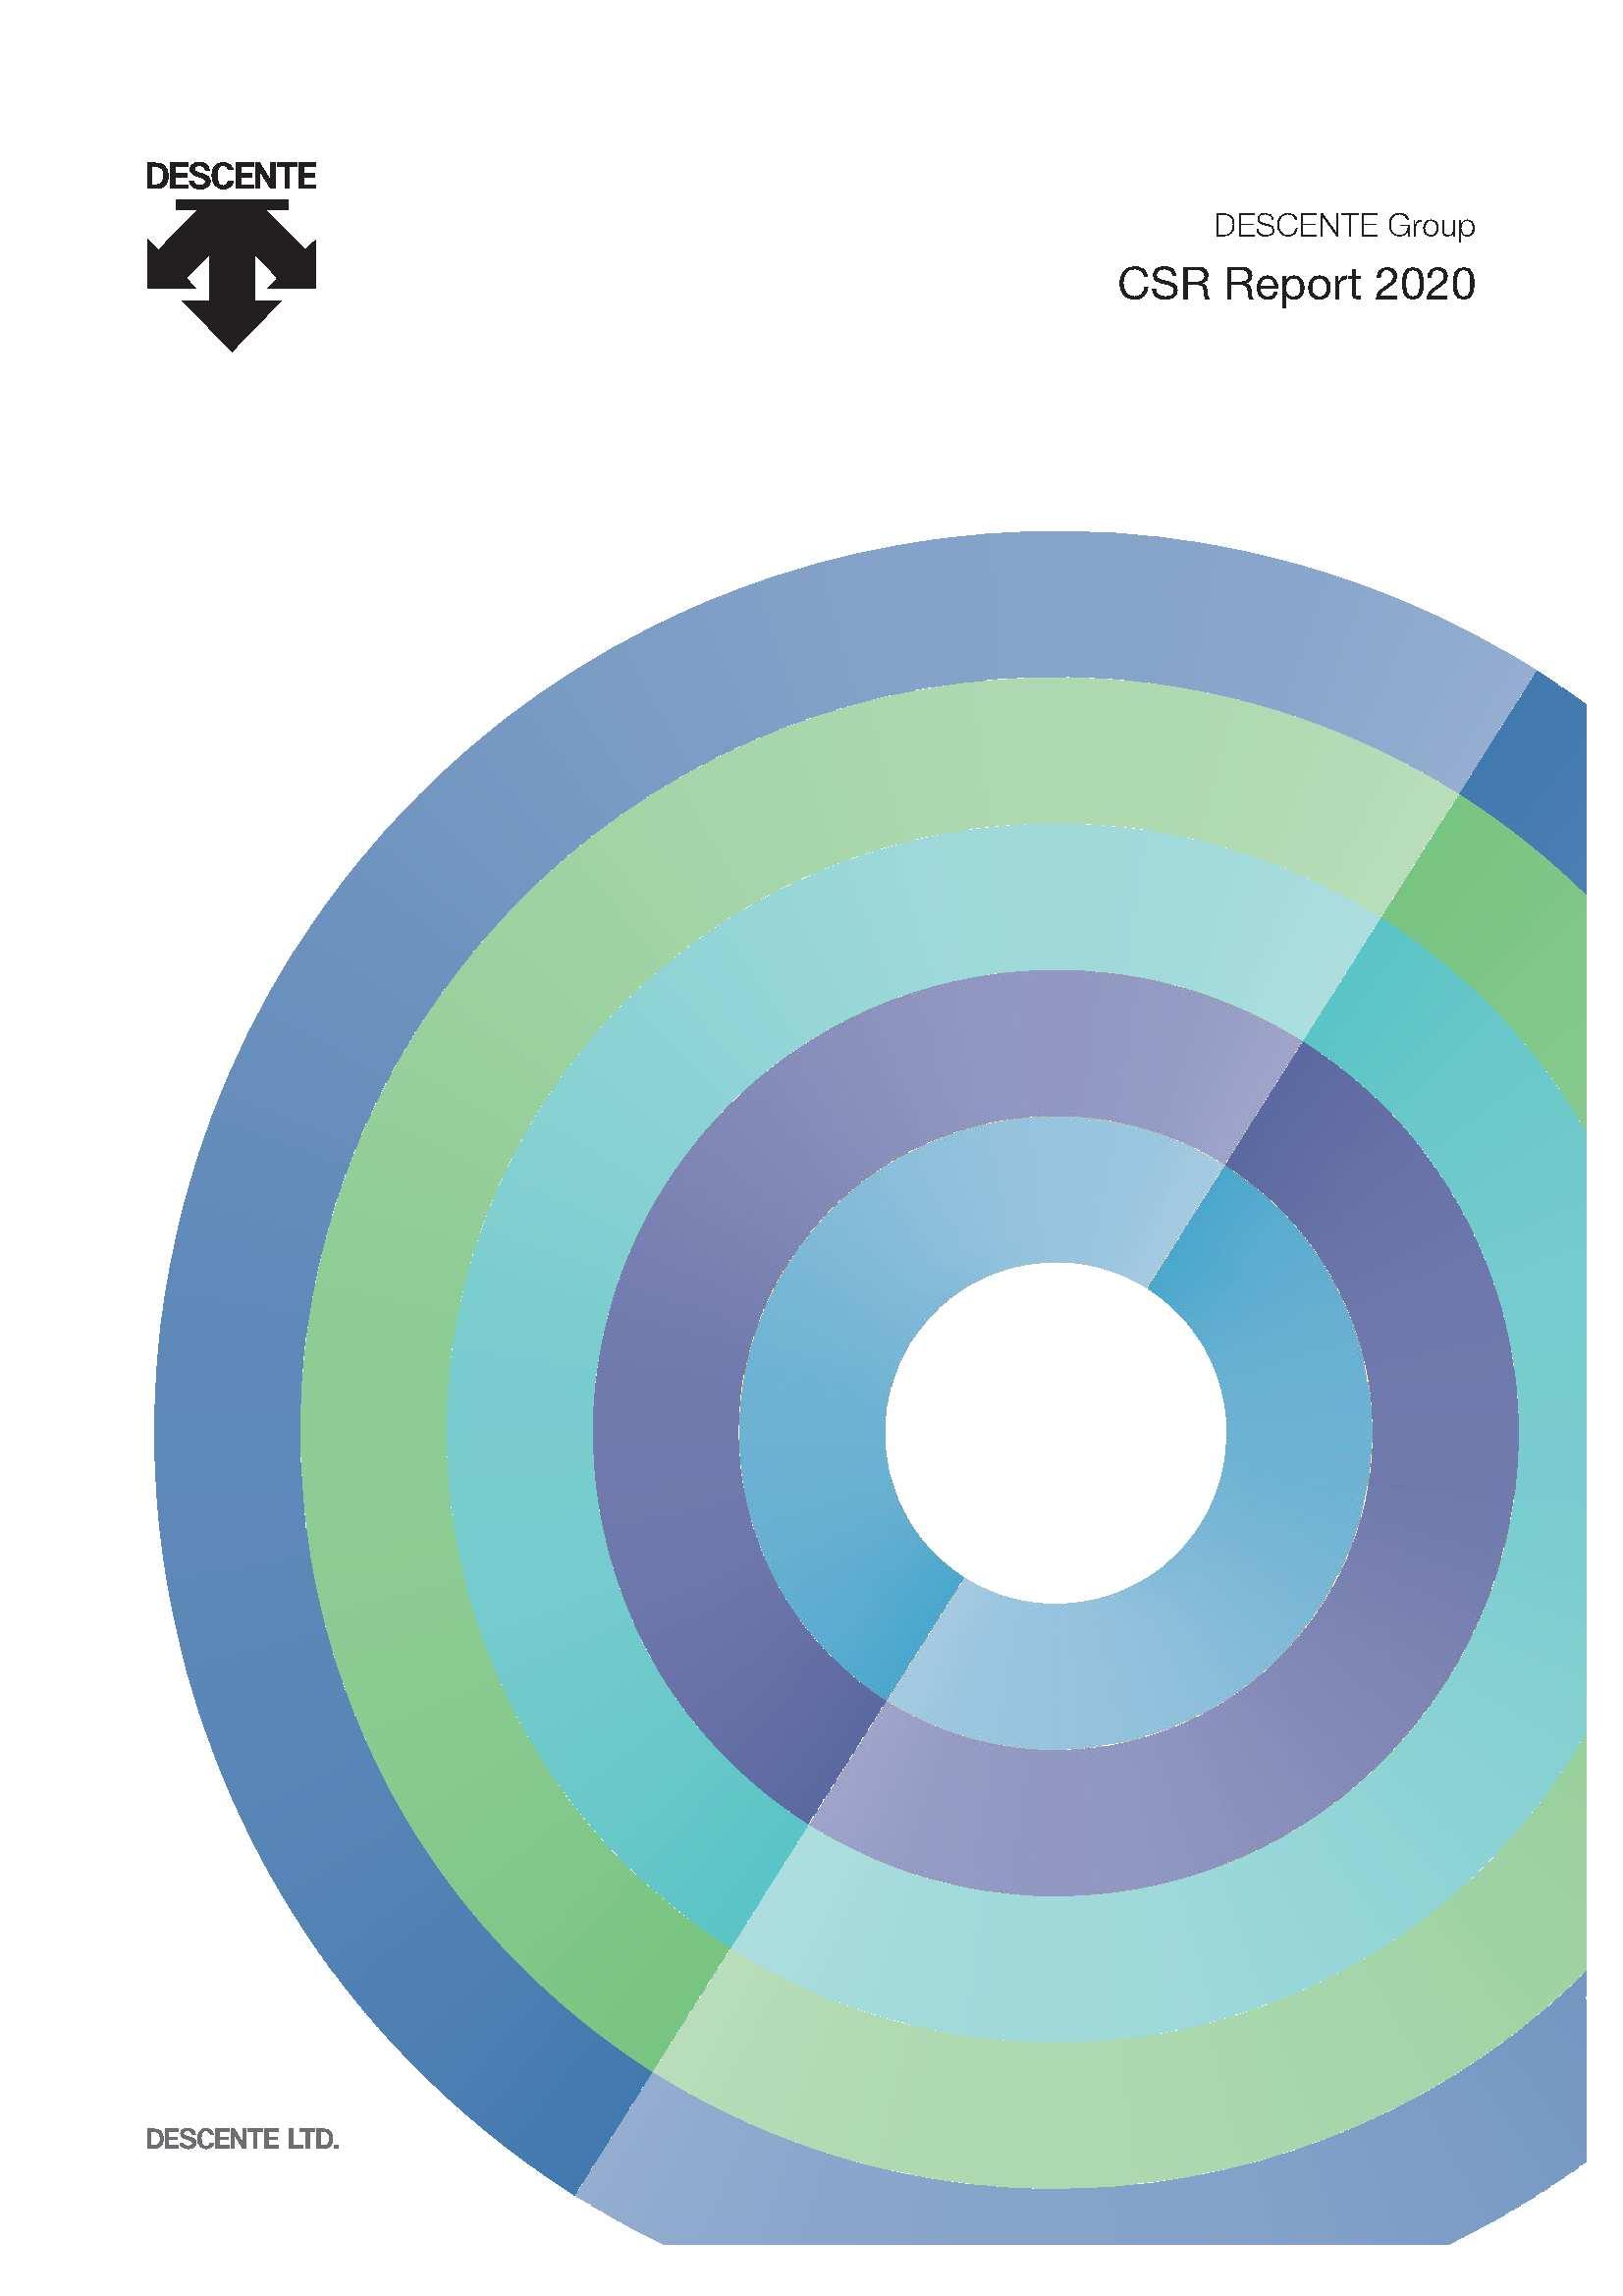 DESCENTE Group CSR Report 2020(English)